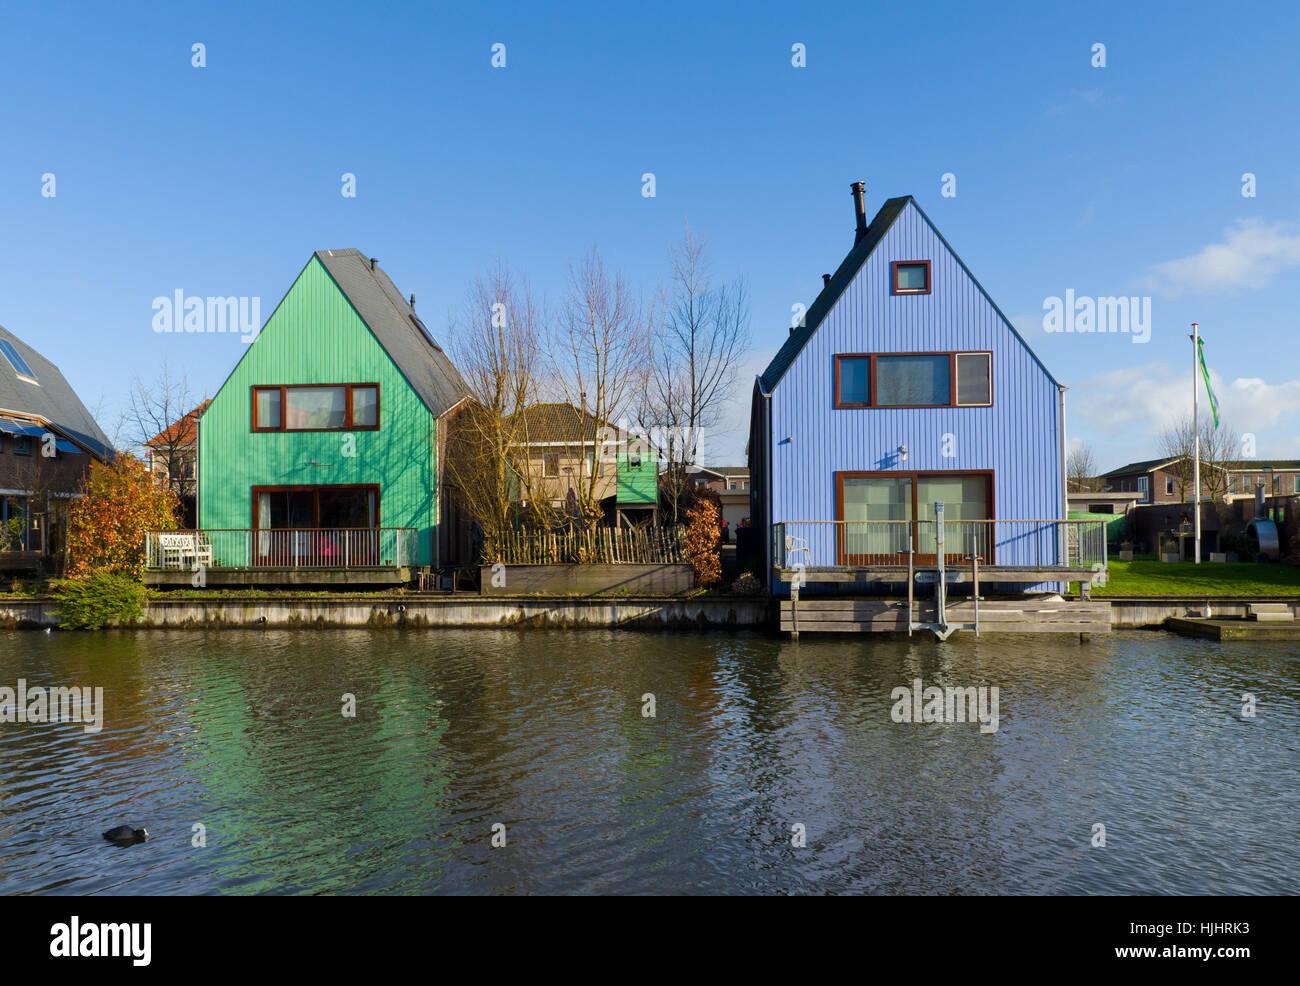 Häuser, Modern, moderne, Holland, Baustil, Architektur Stockfoto ...